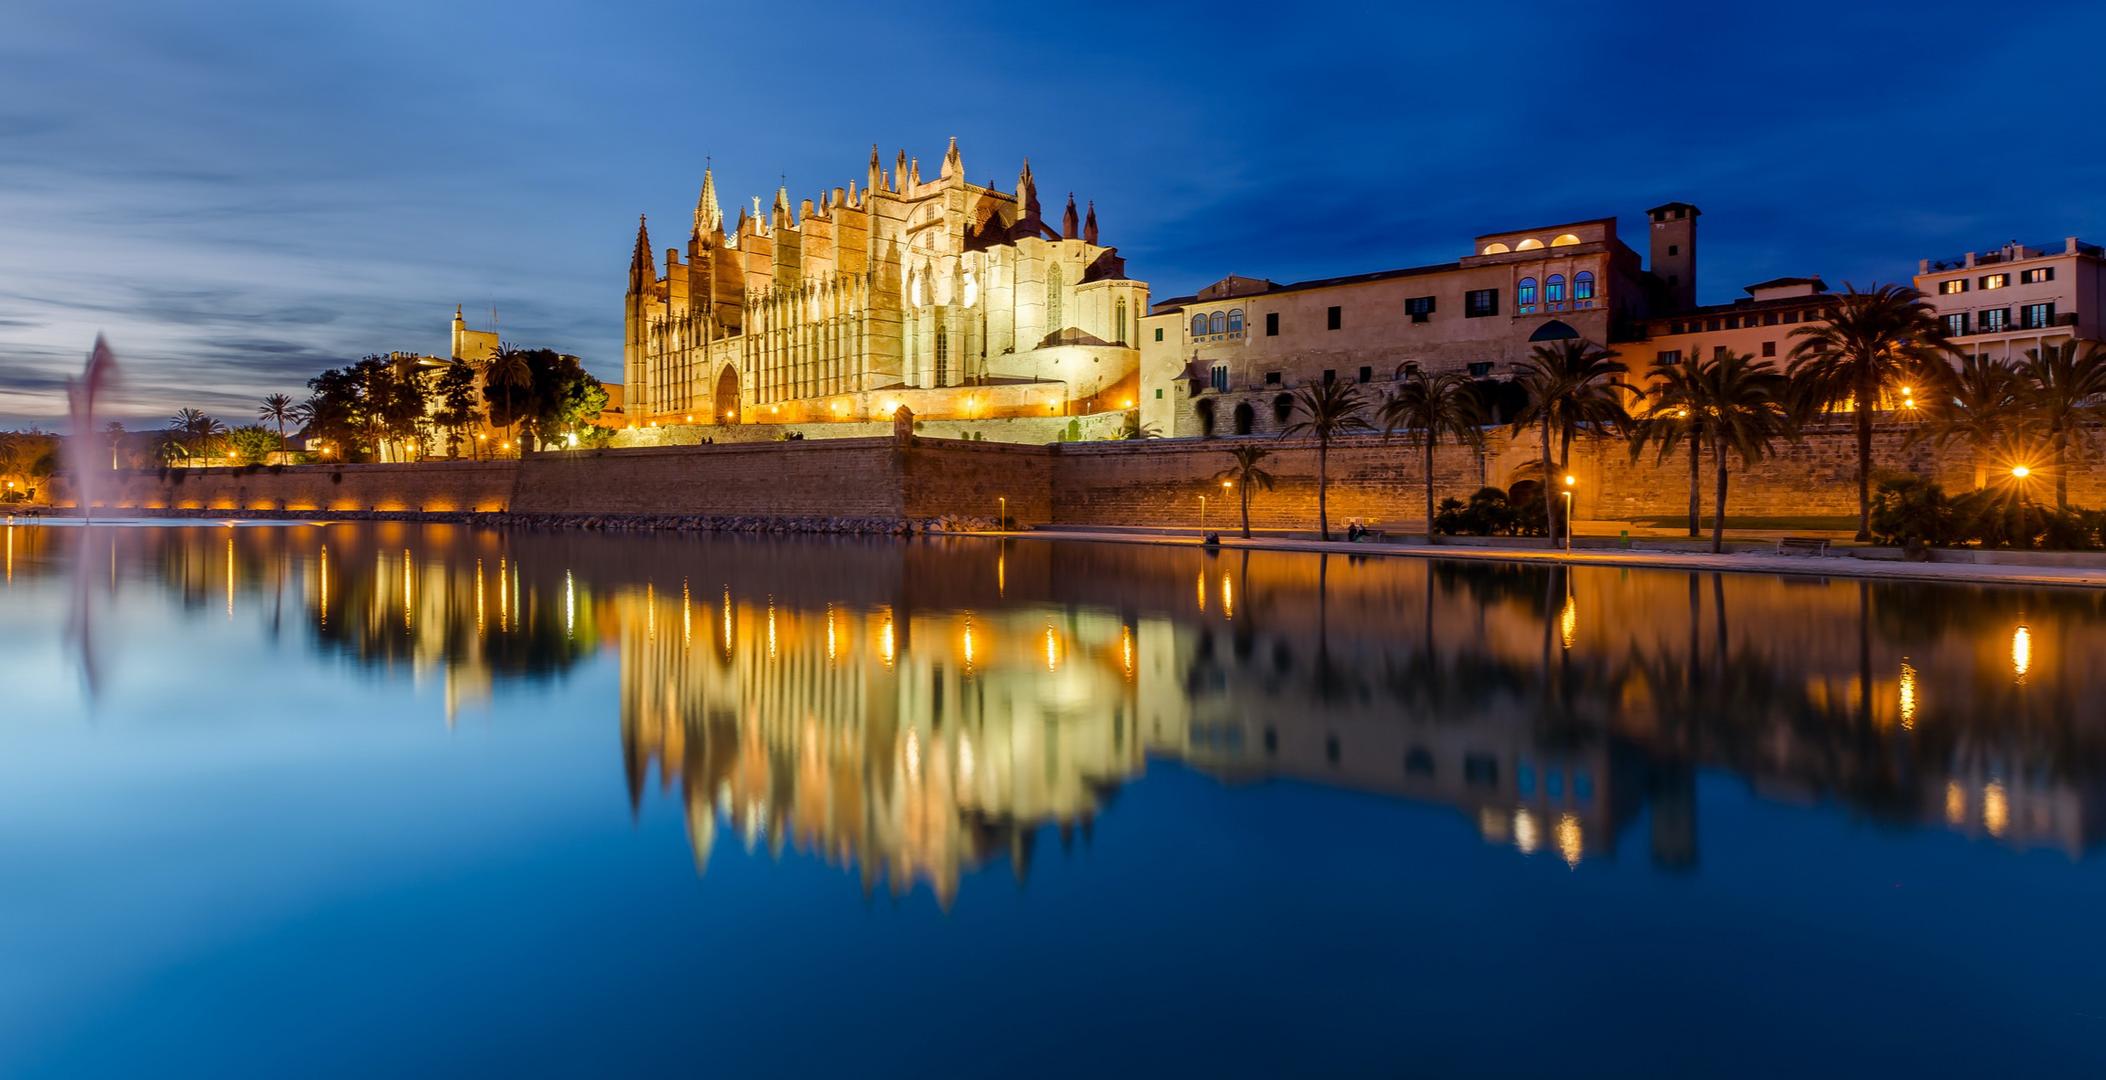 Mallorca_4_edited_edited_edited.png